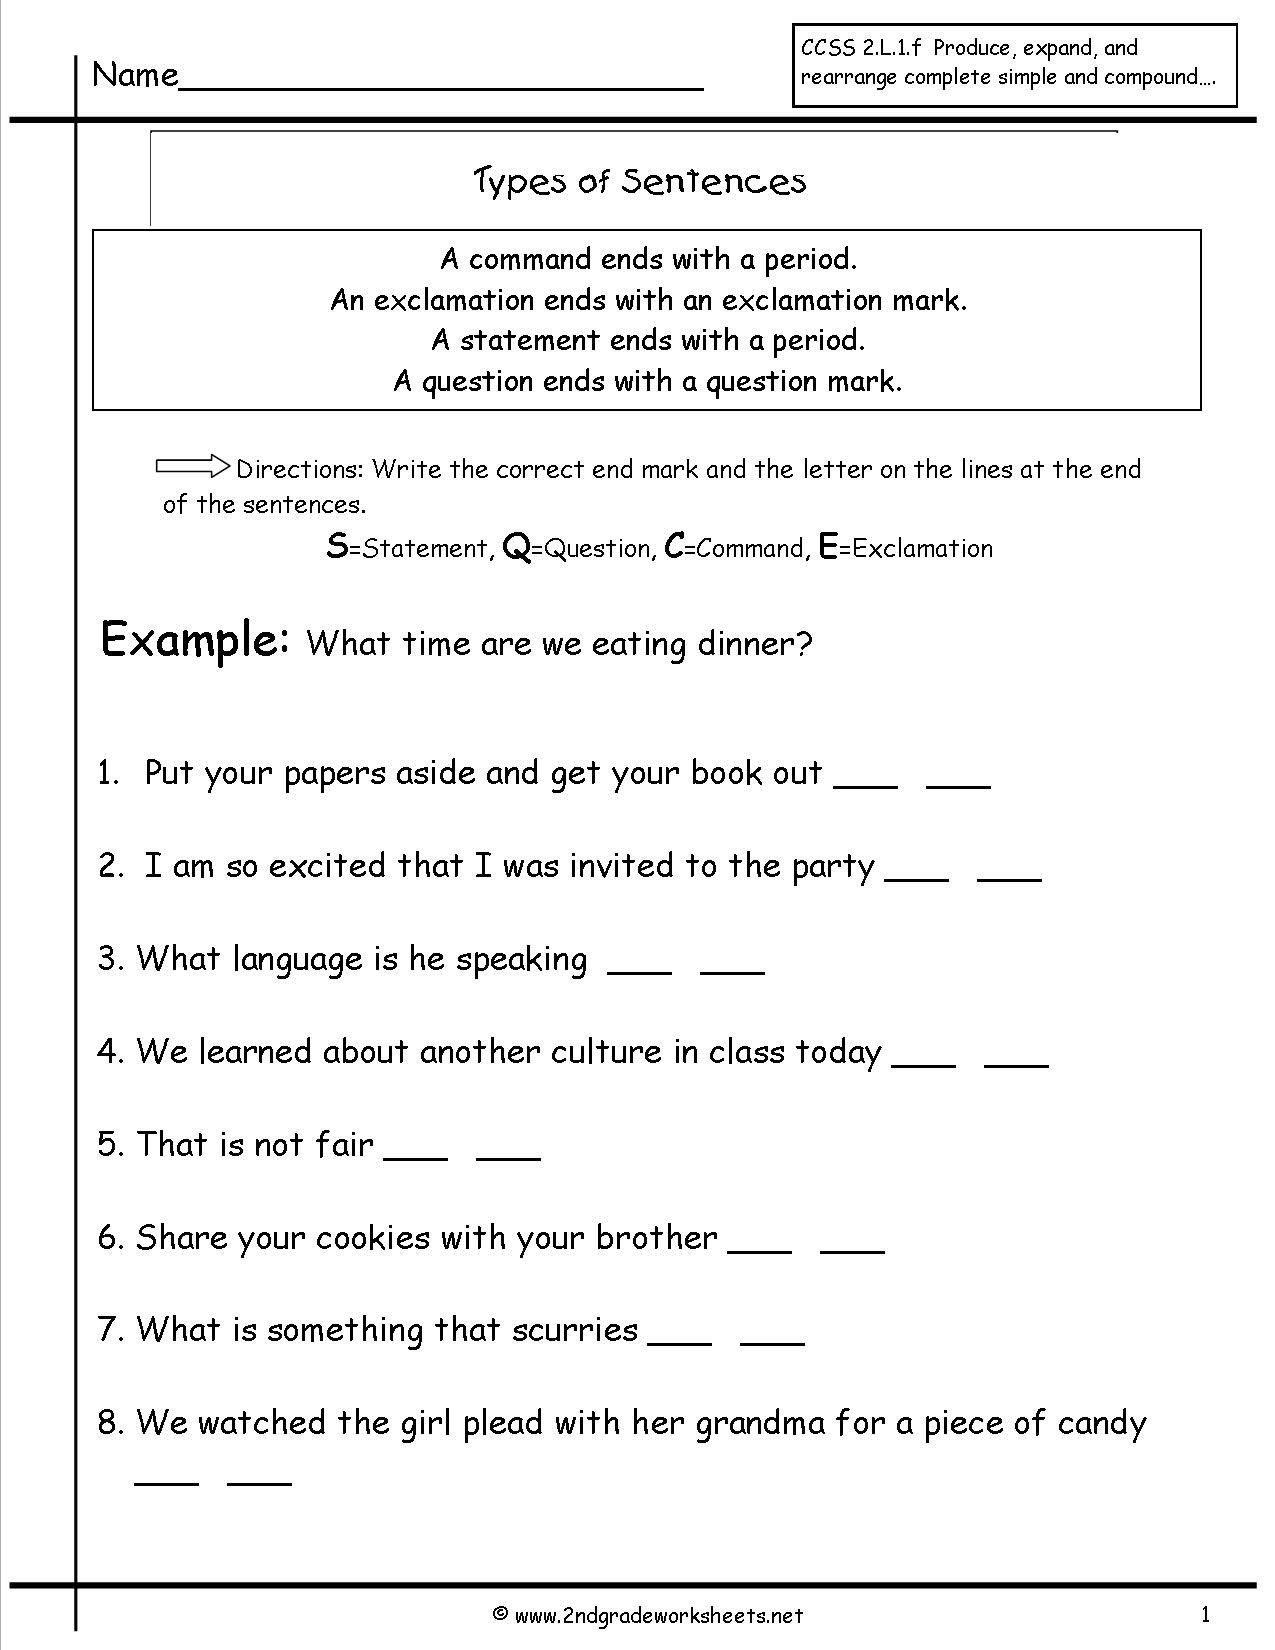 medium resolution of Complex Sentences Worksheet 5th Grade Second Grade Sentences Worksheets  Ccss 4th S… in 2020   Types of sentences worksheet